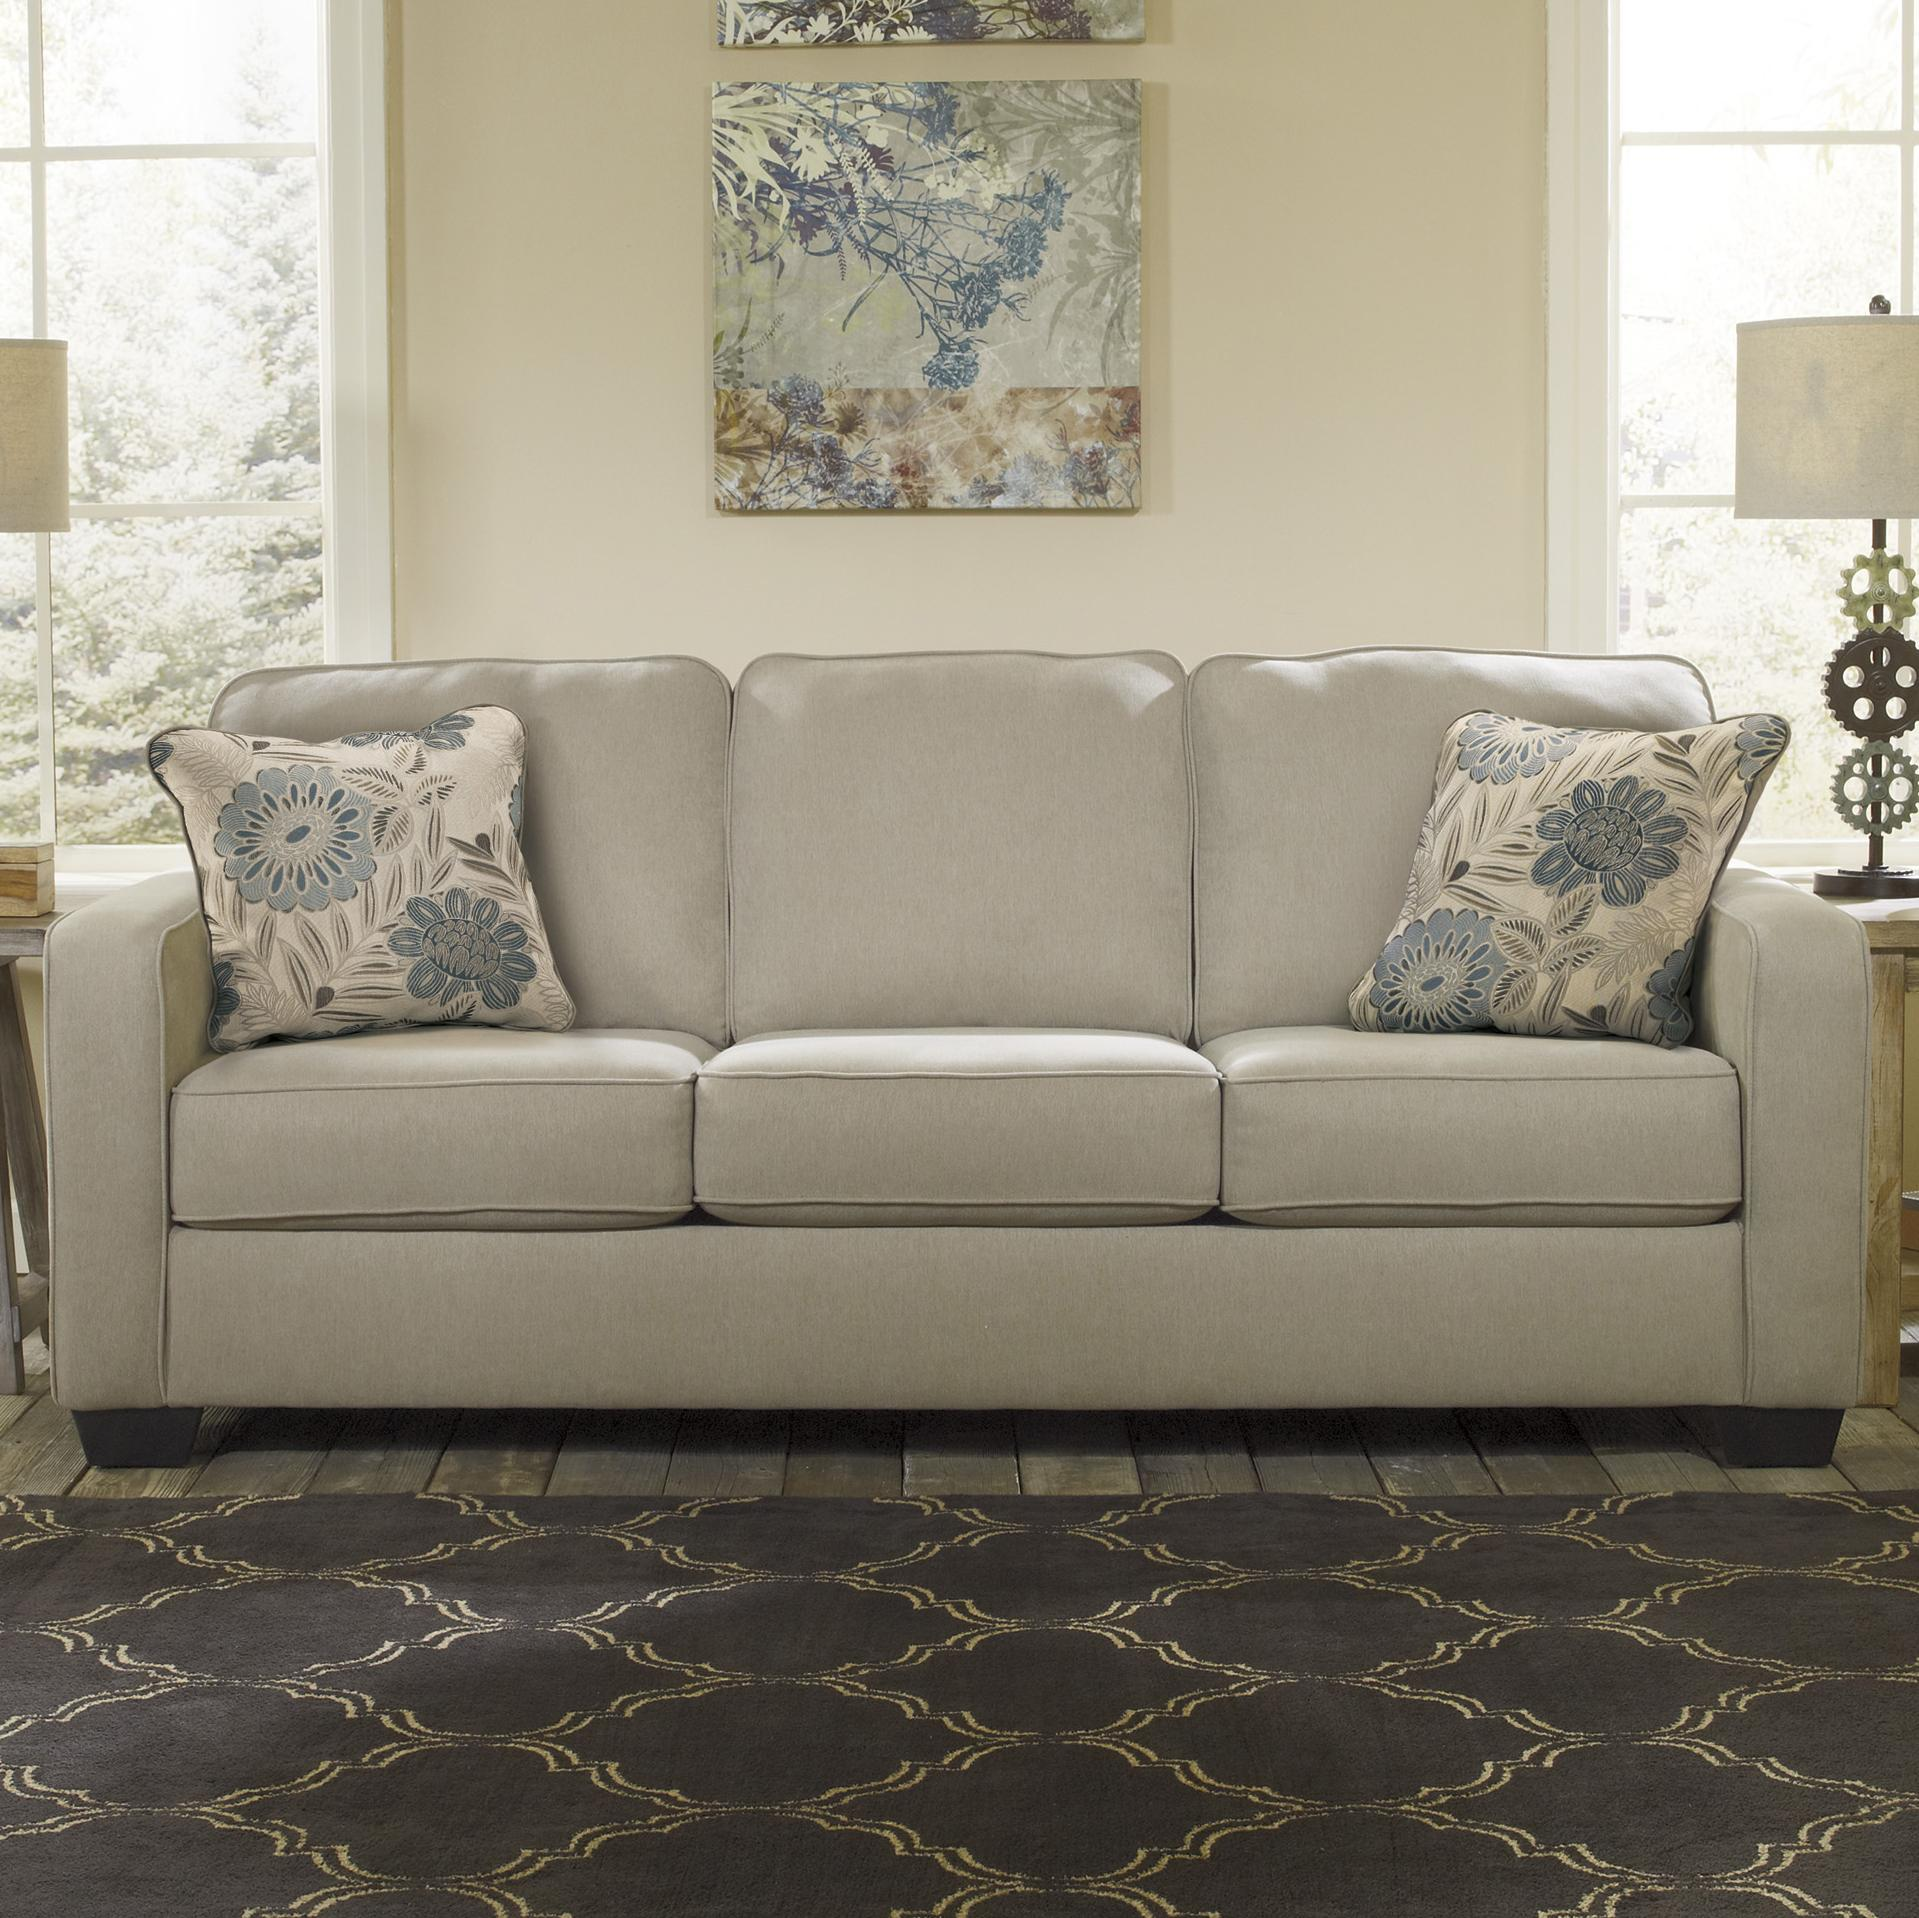 Signature Design by Ashley Furniture Alenya - Khaki Sofa - Item Number: 1669938